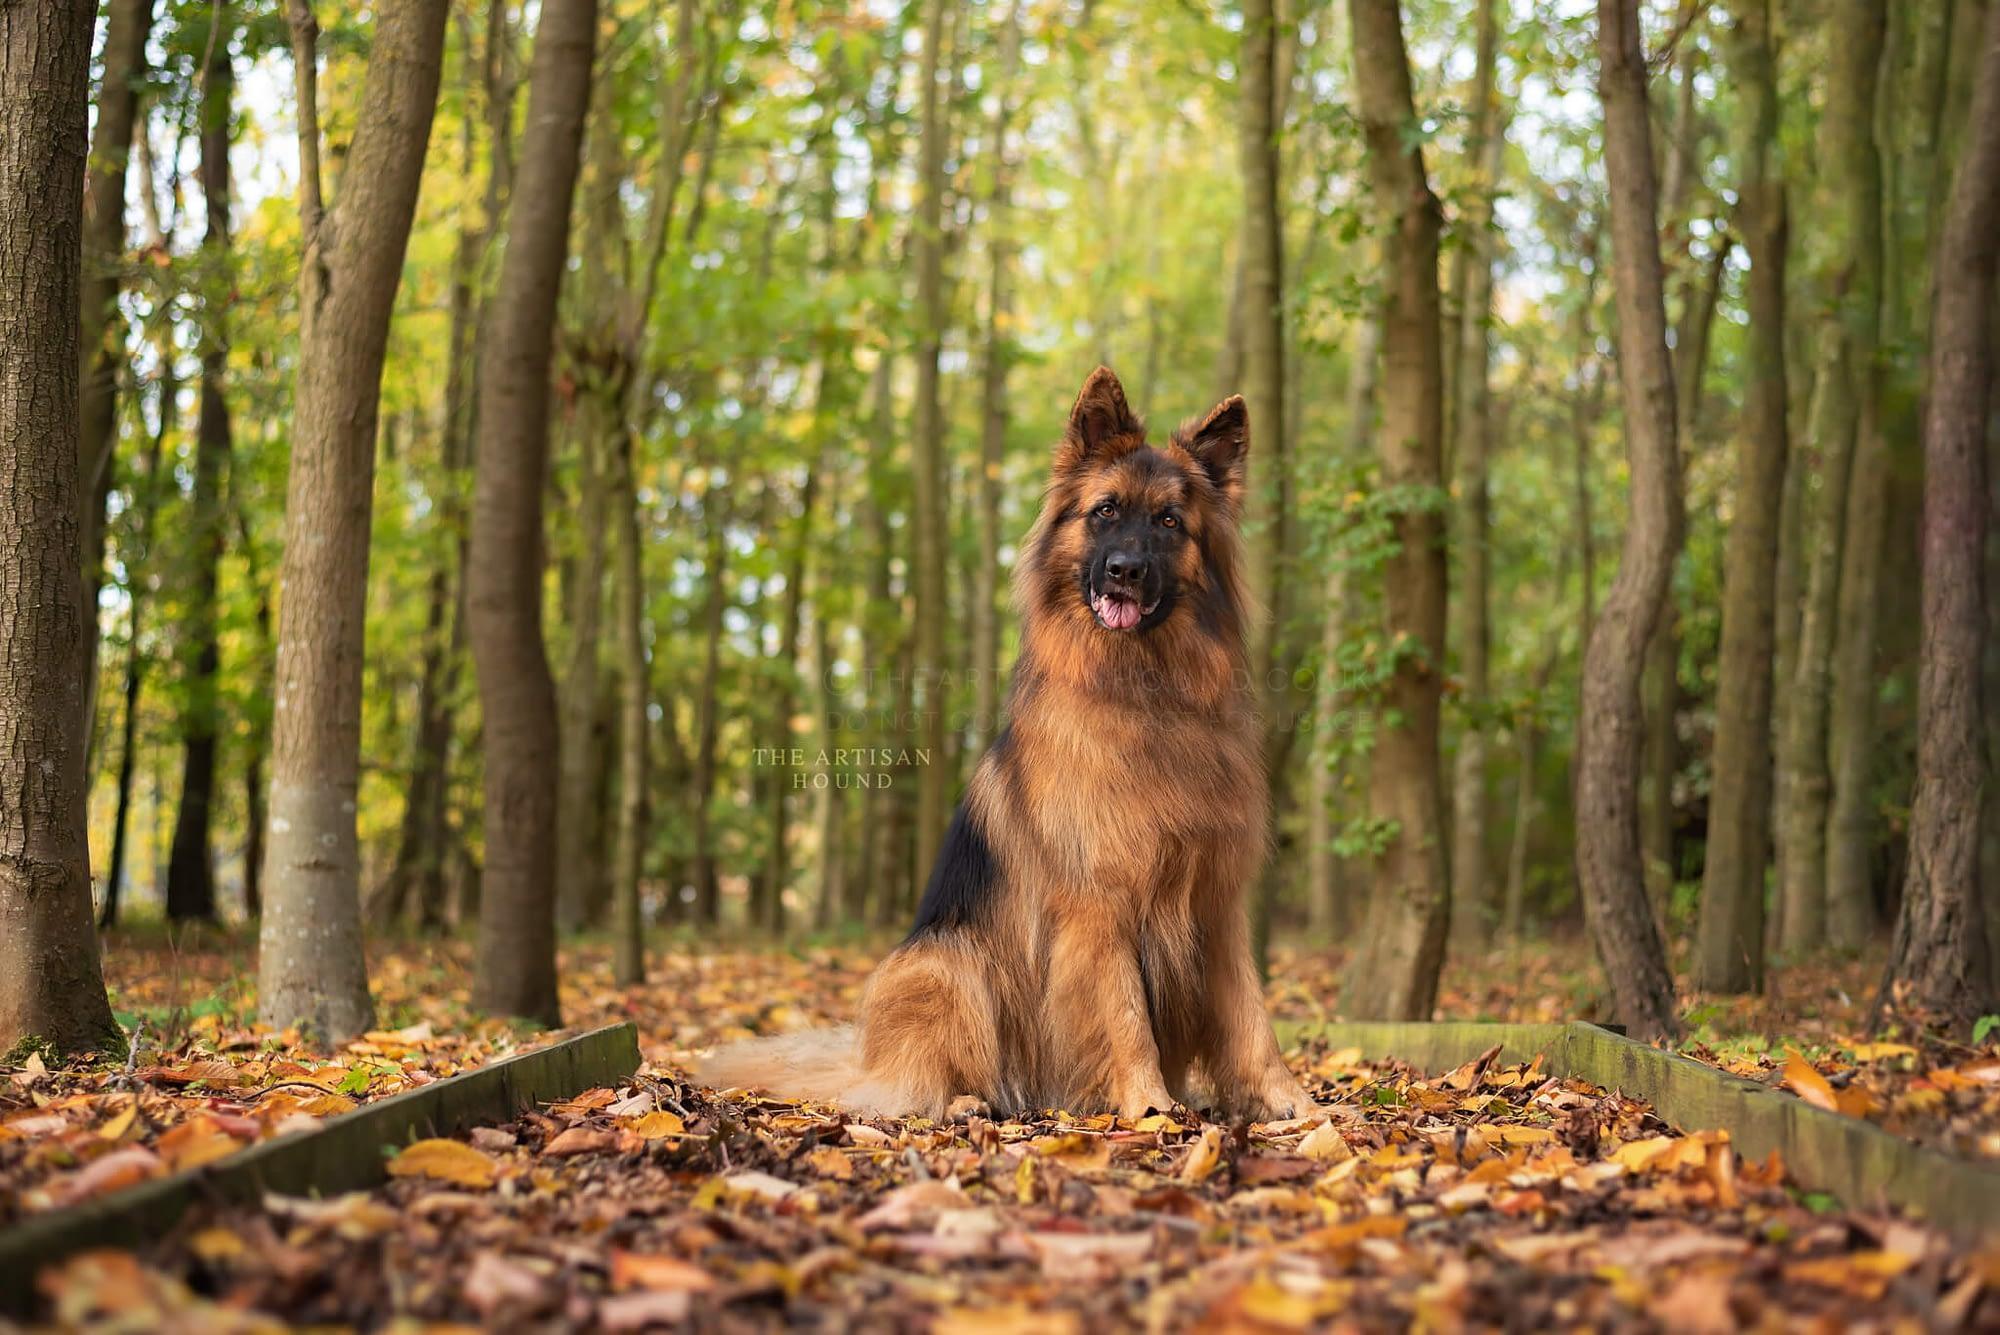 German Shepherd sitting on path in autumn leaves